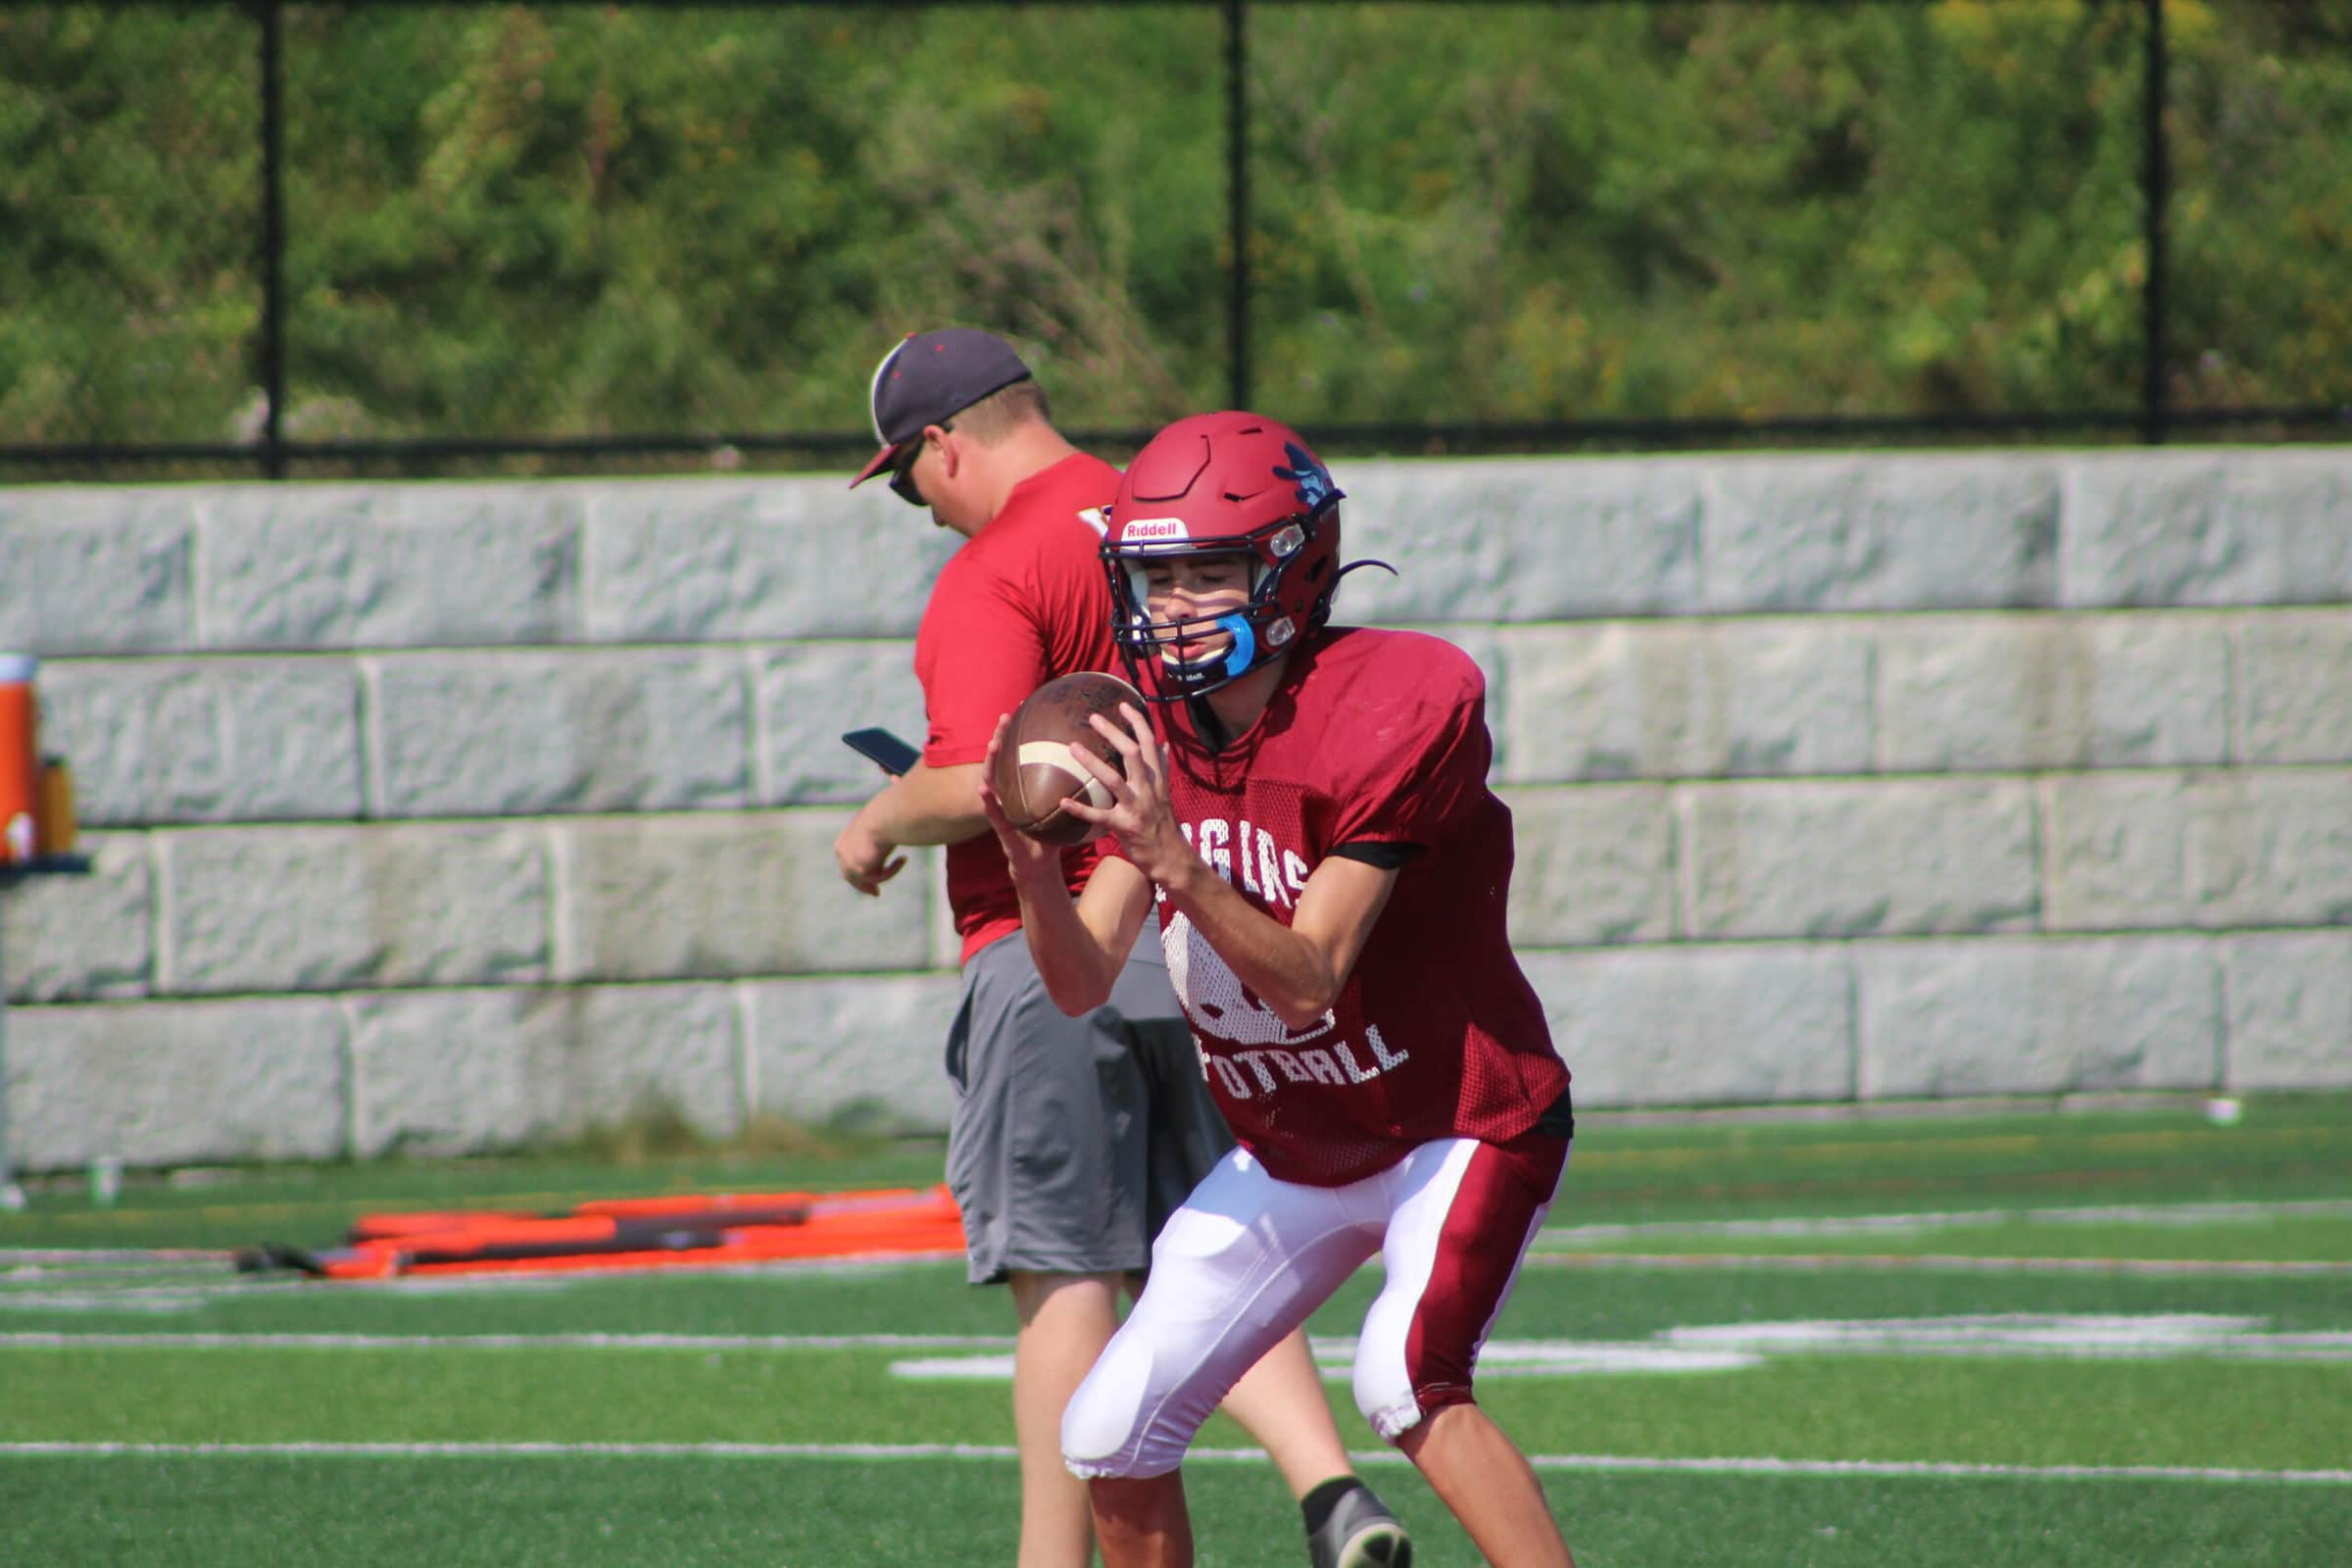 Westborough quarterback prepares to throw the ball. (Photo/Laura Hayes)